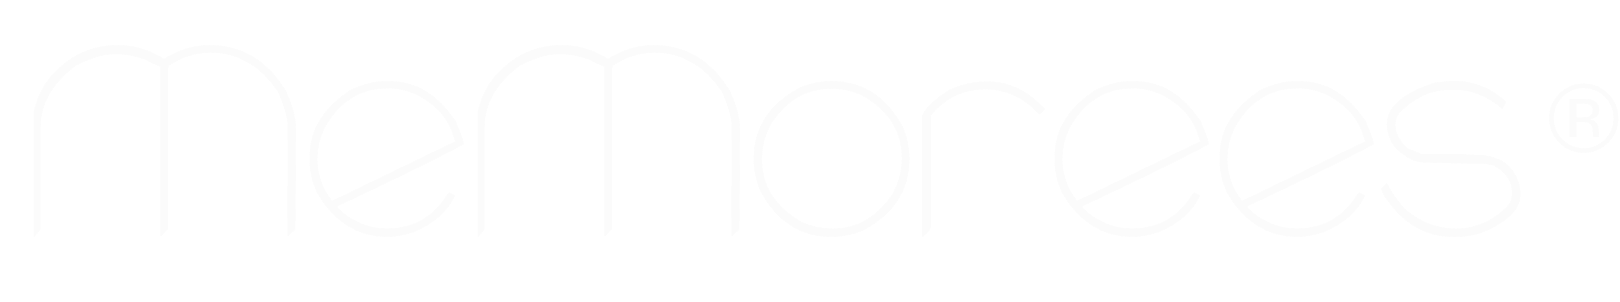 MeMorees